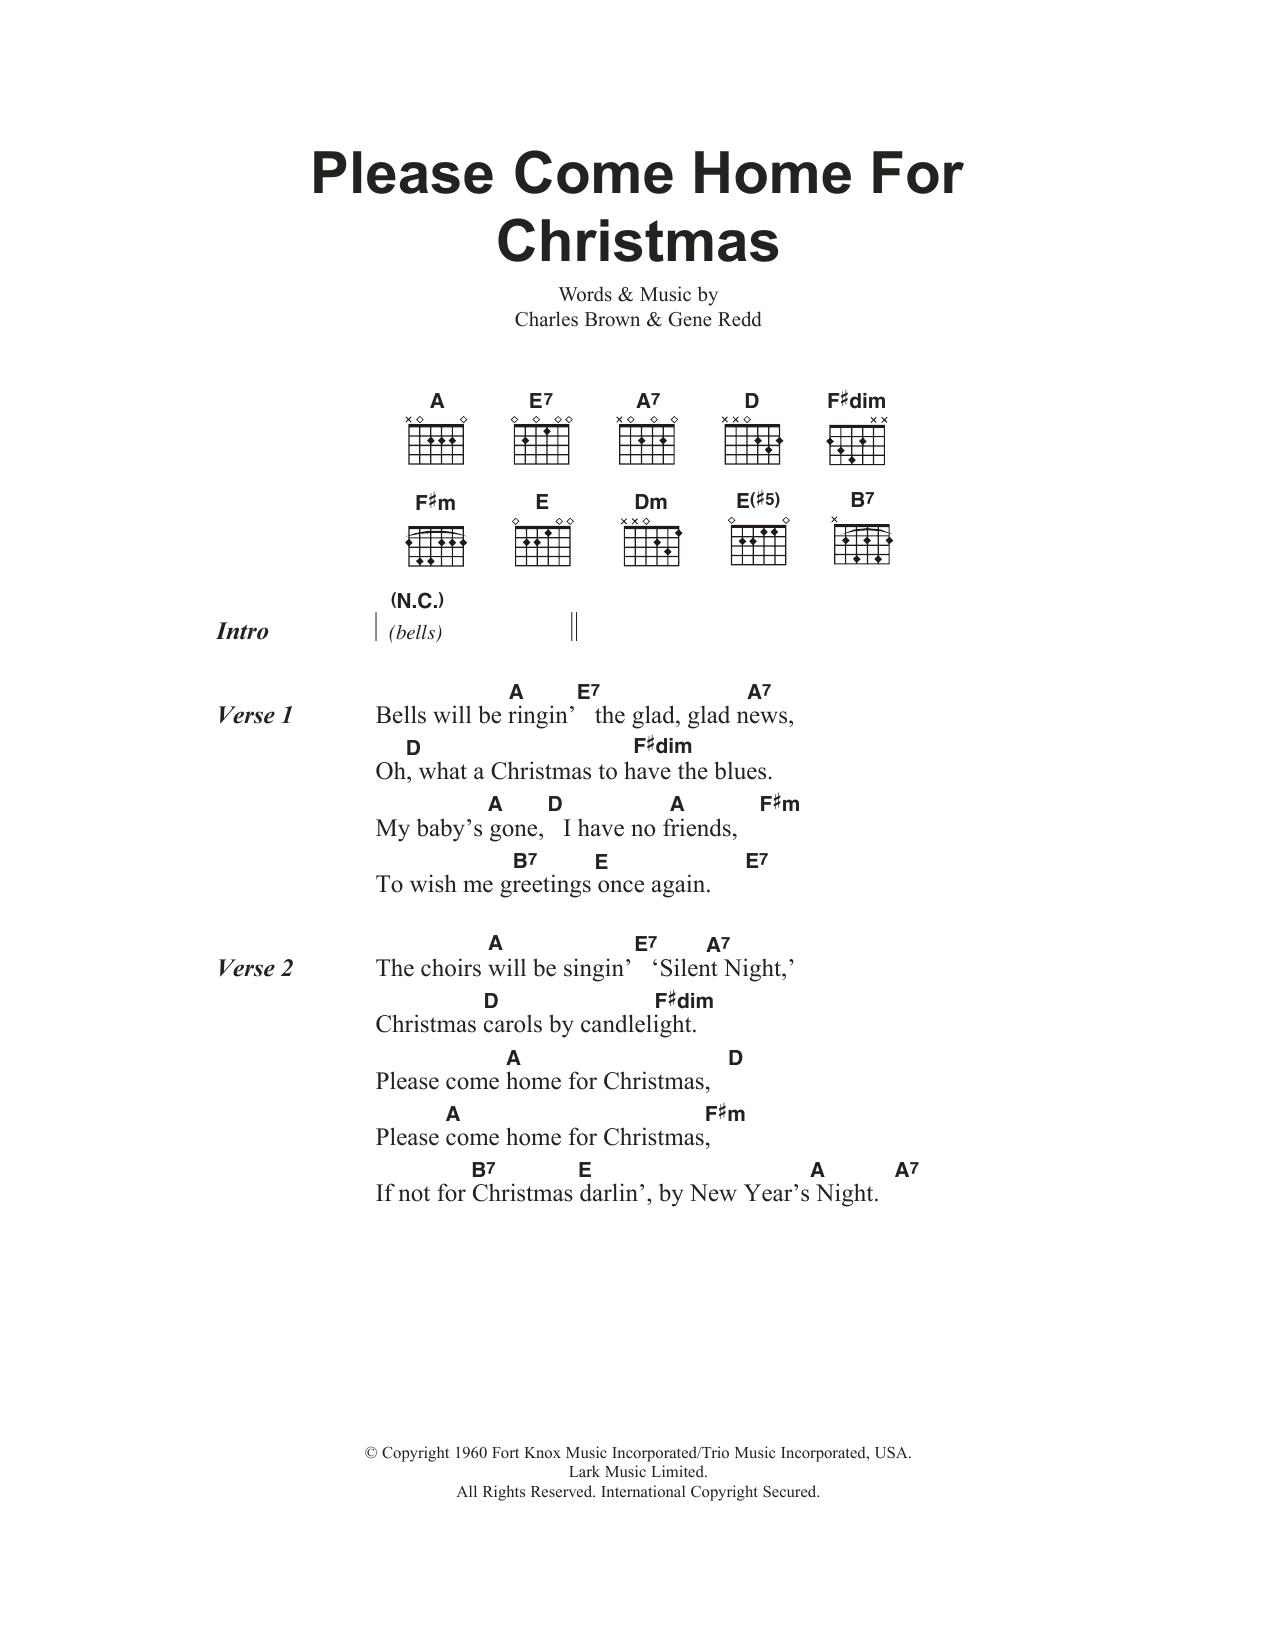 please come home for christmas sheet music - Christmas Blues Lyrics